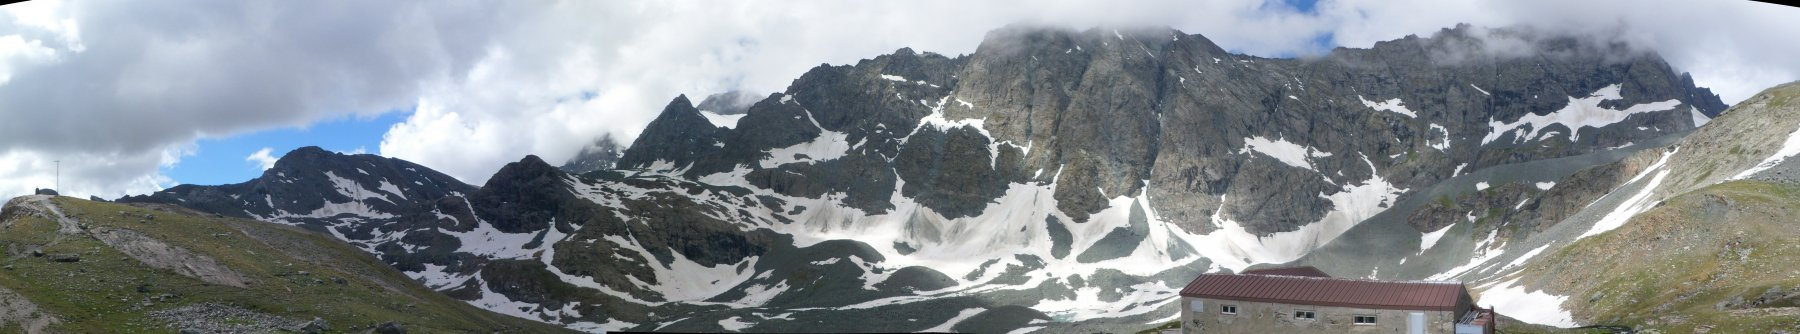 Panorama dal Gastaldi